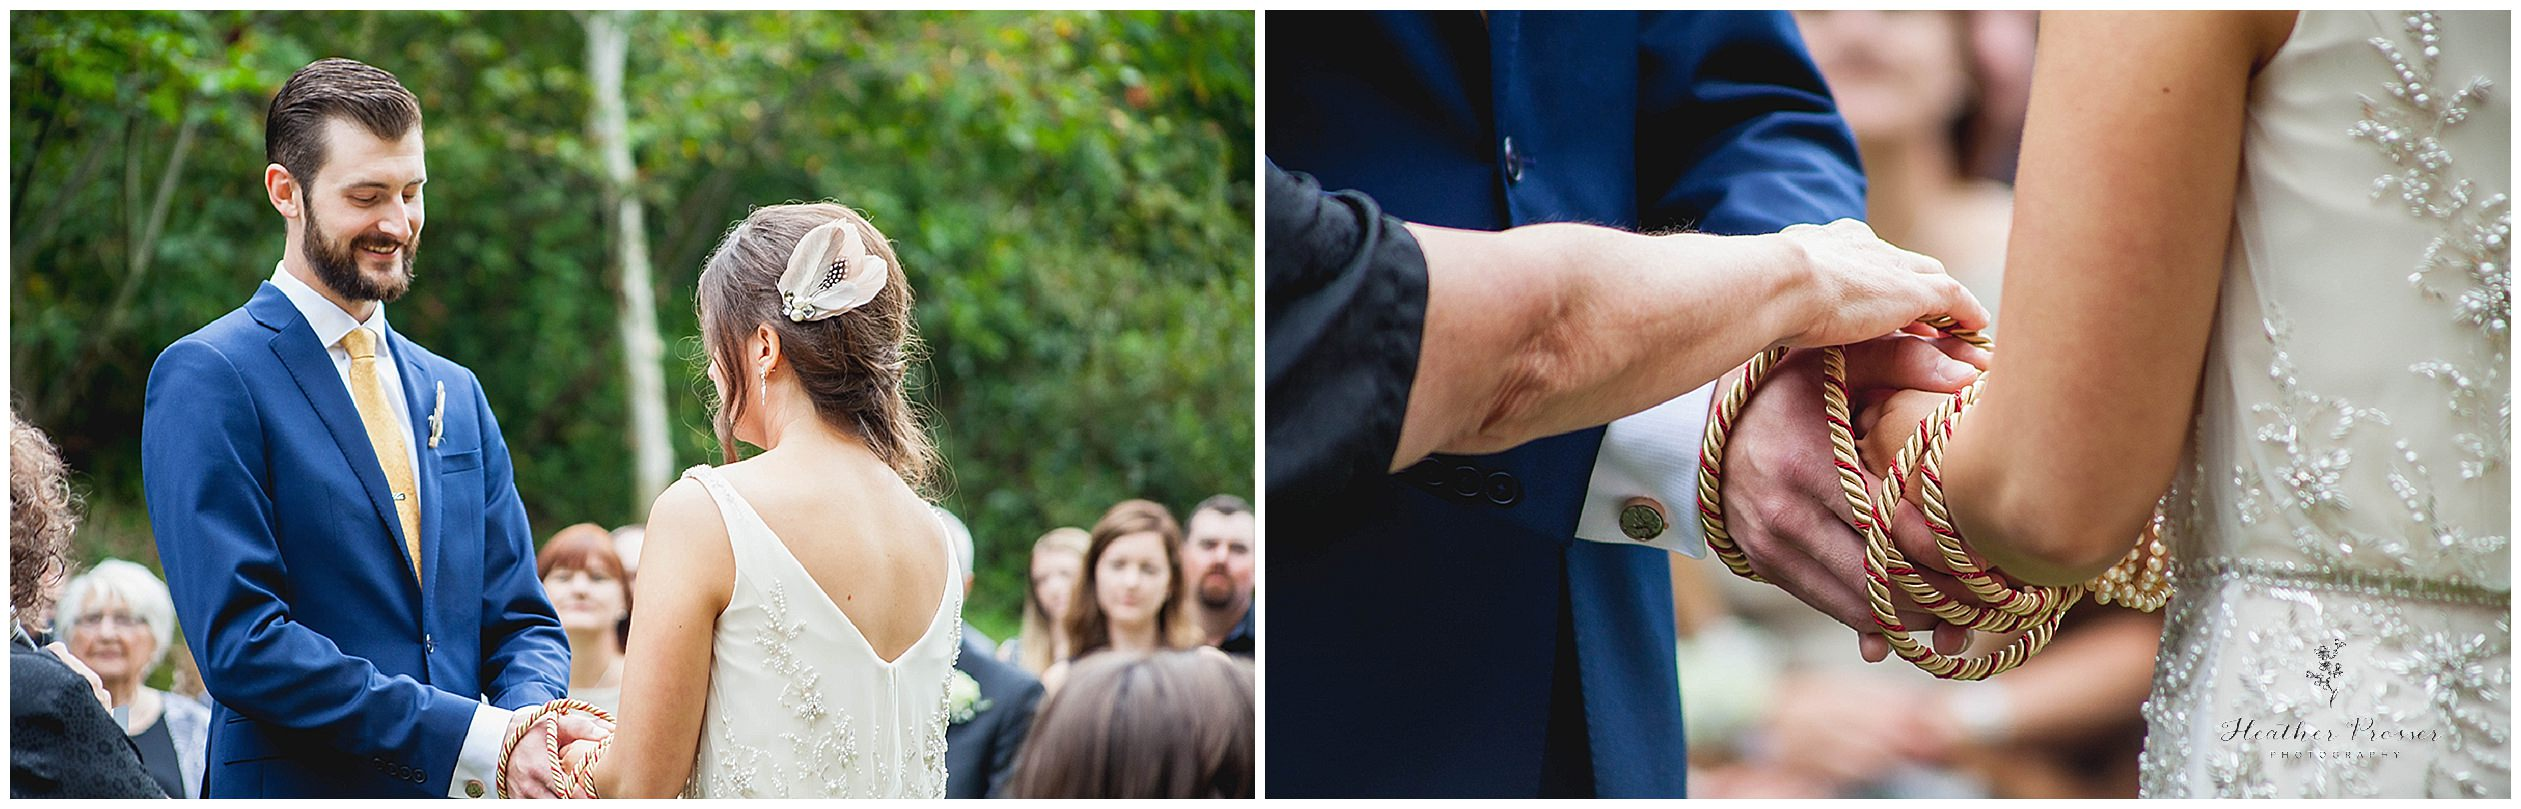 Bowmanville Wedding Photography_0200.jpg